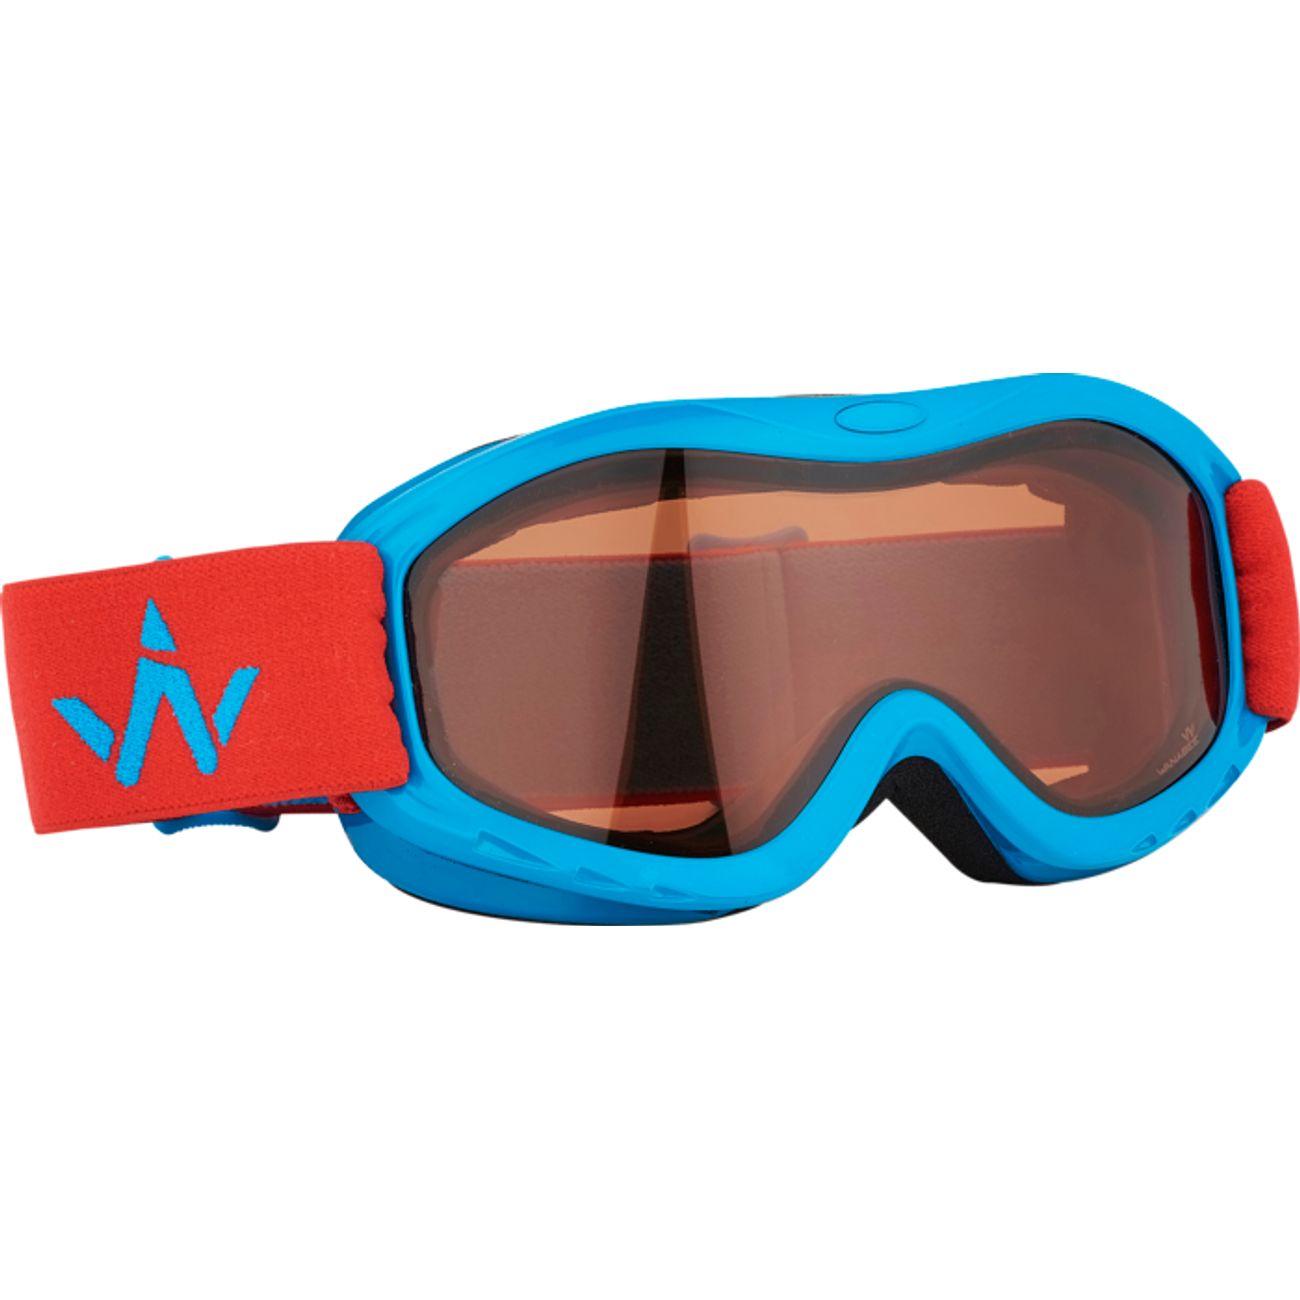 MASQUE Ski enfant WANABEE BIRDY 100